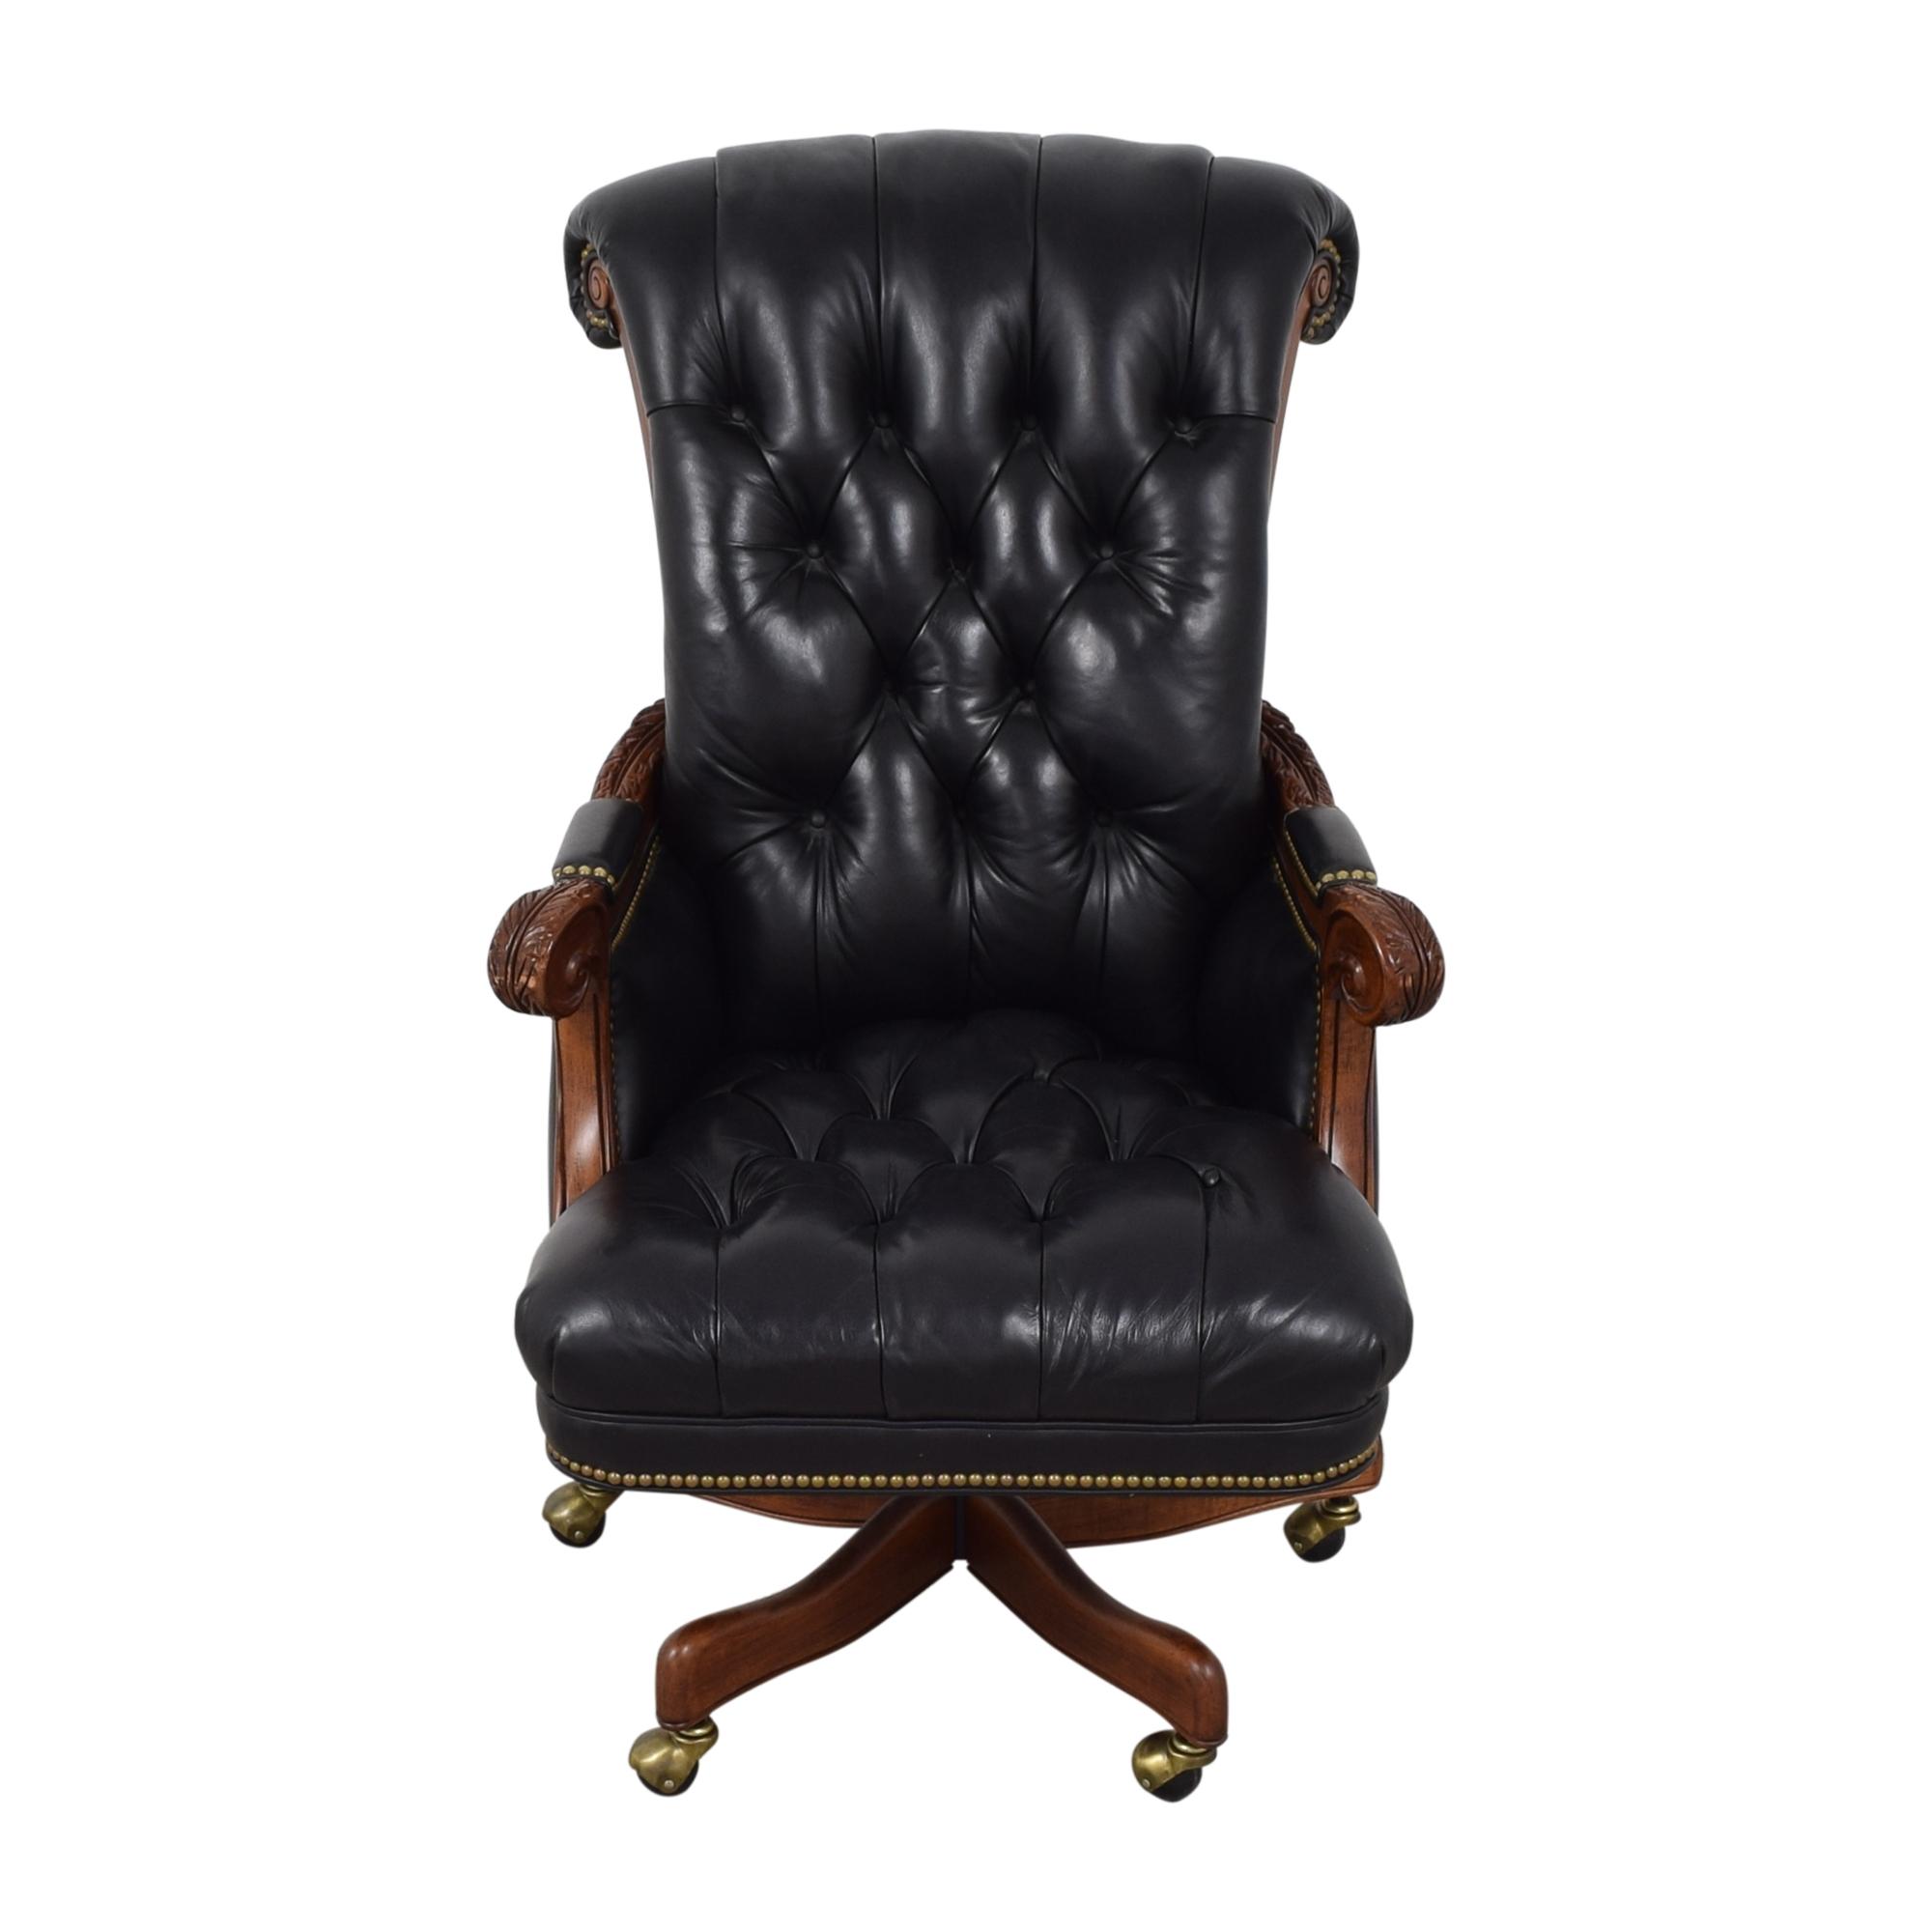 Hancock and Moore Hancock and Moore Patriot Swivel-Tilt Chair discount